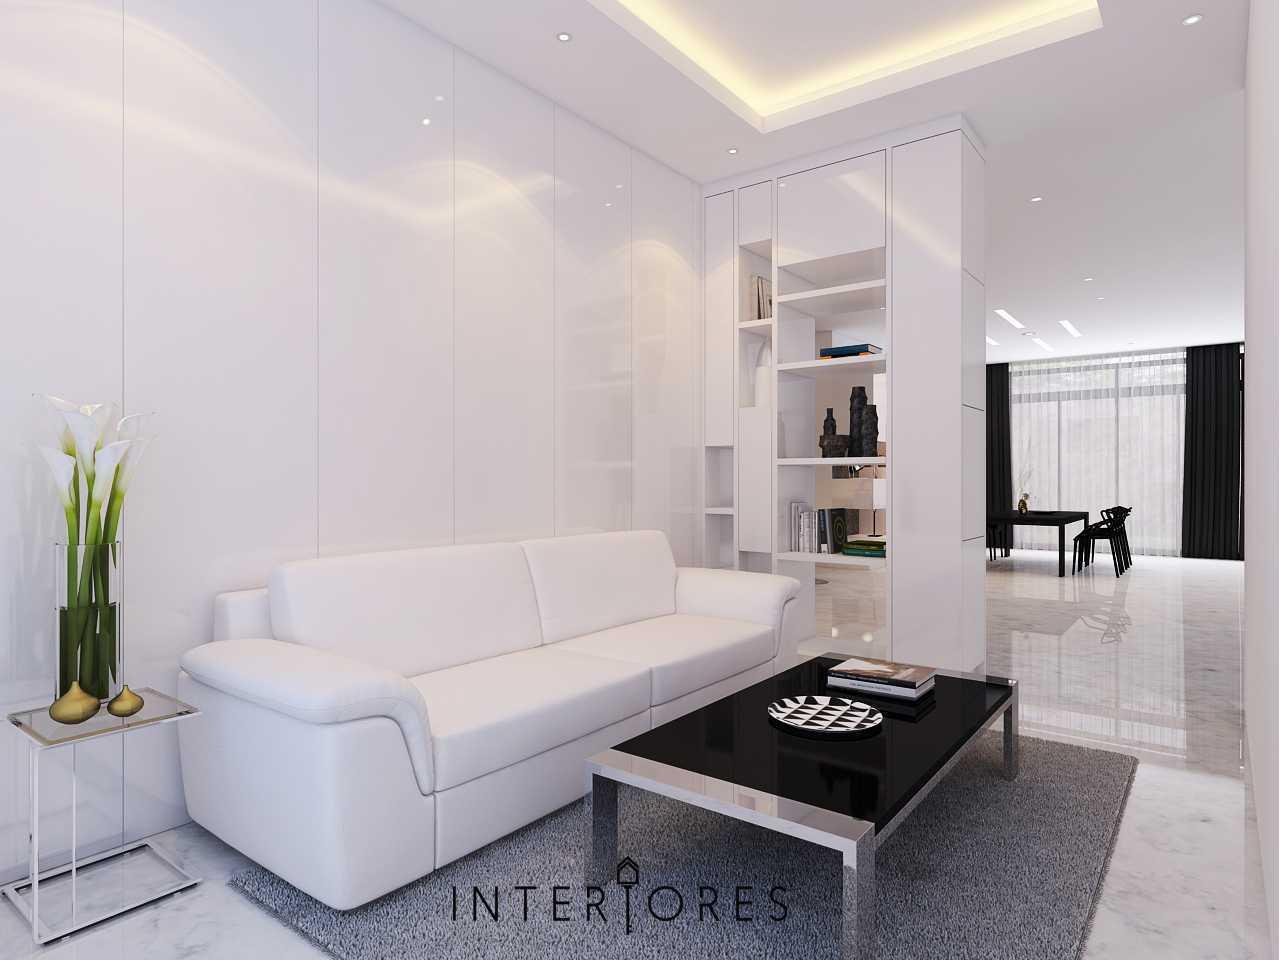 Interiores Interior Consultant & Build Sutera Onyx Alam Sutera Alam Sutera Ruang-Tamu Modern, Minimalis  17708